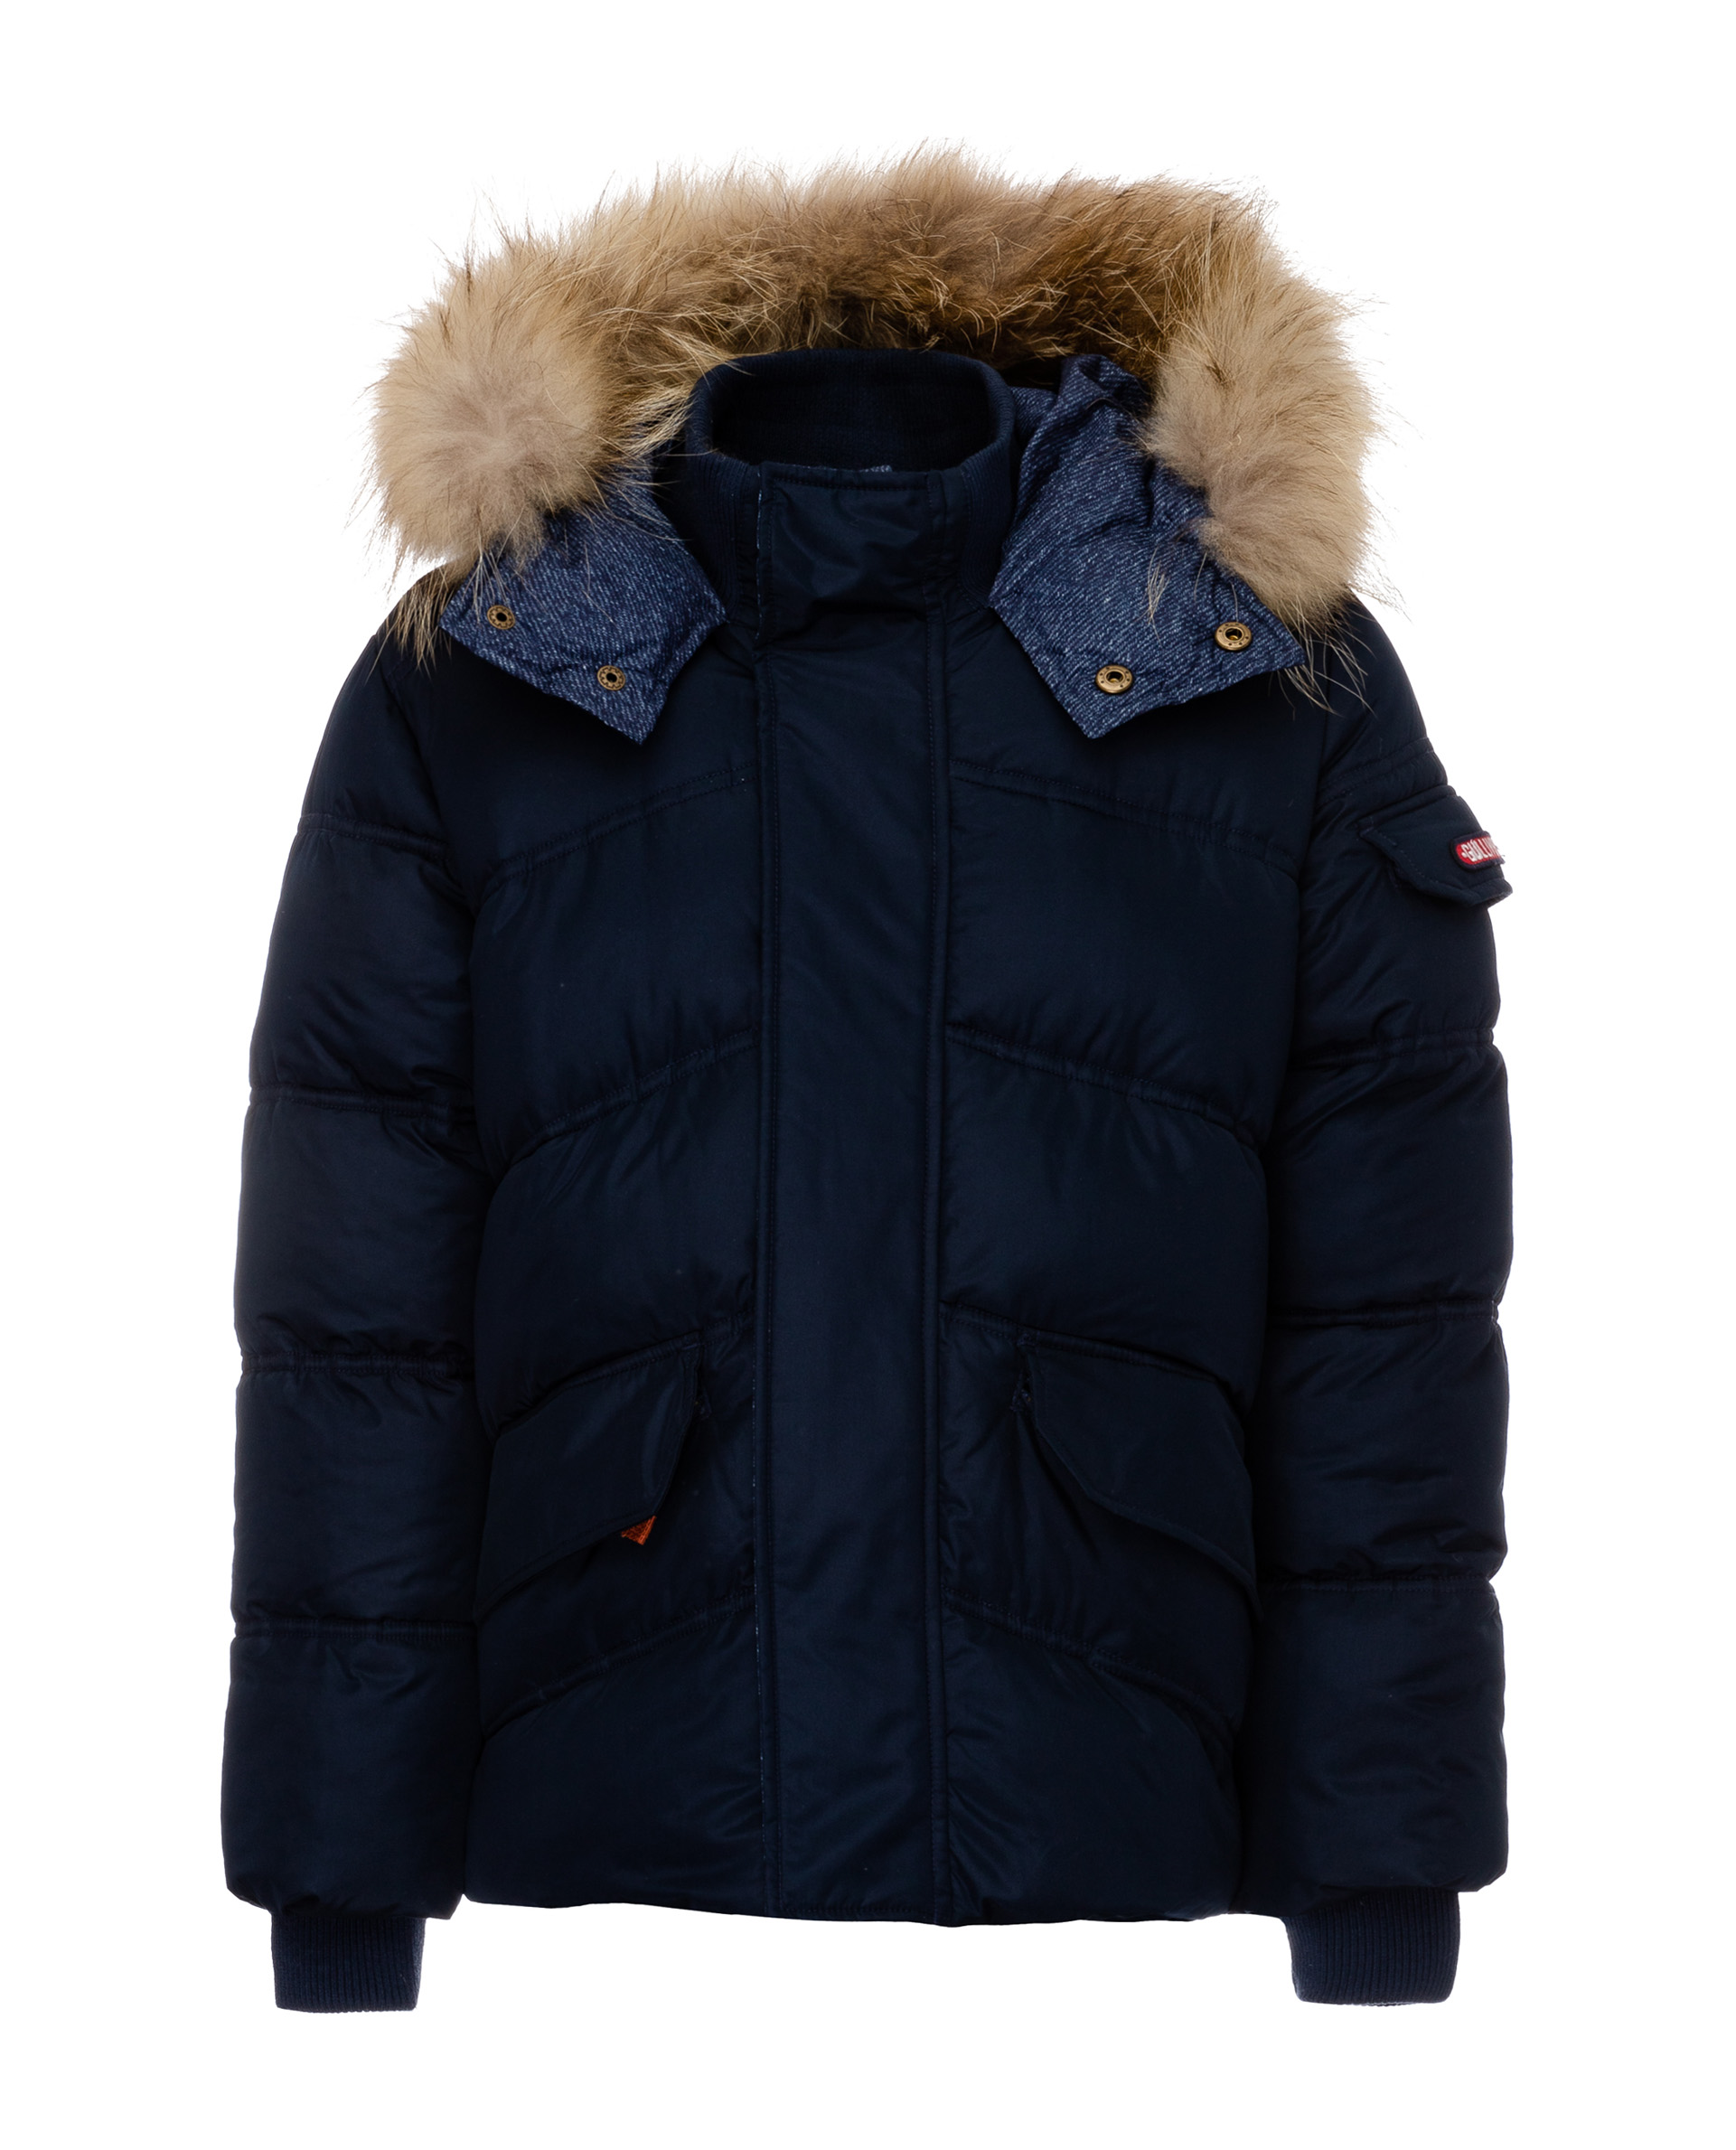 Купить 21911BJC4107, Куртка для мальчиков Gulliver, цв. синий, р.140,